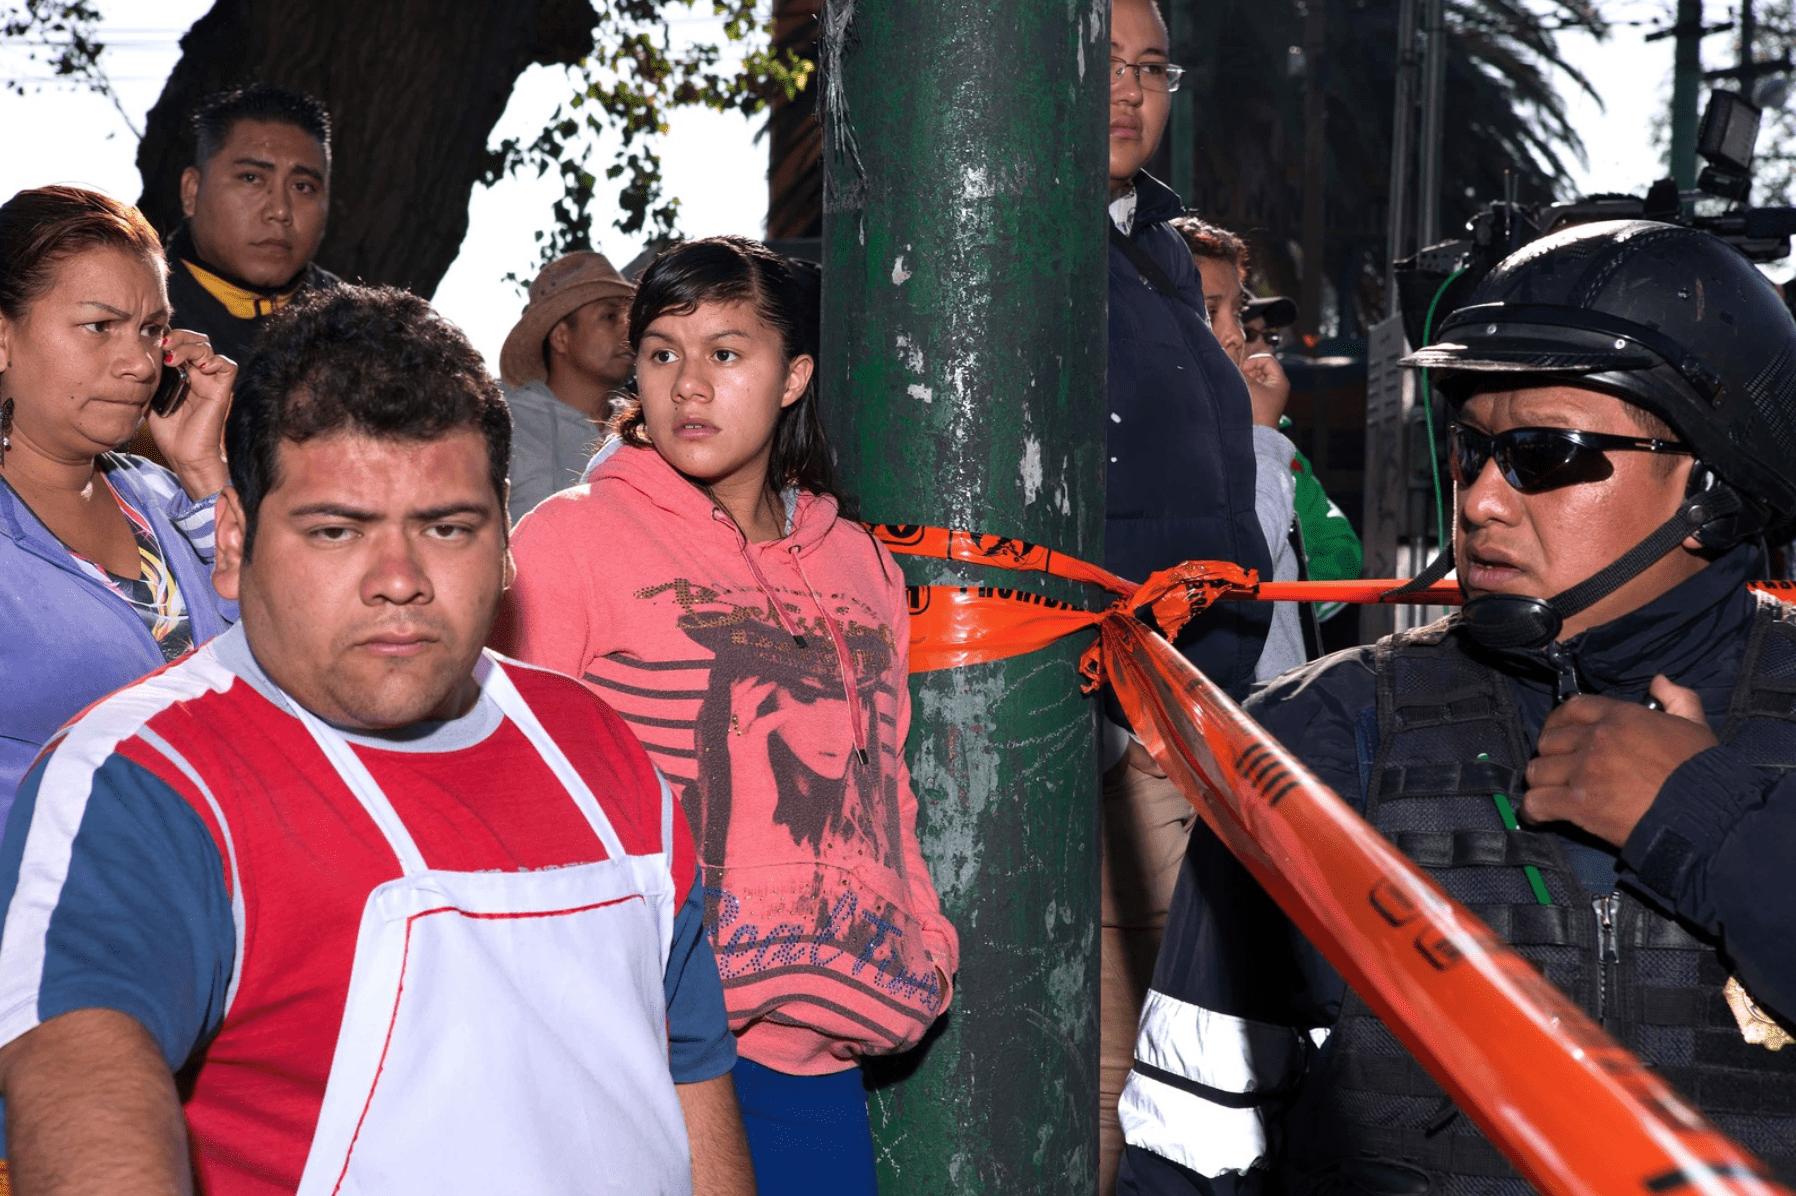 José Luis Cuevas: On the Resistance of Bodies